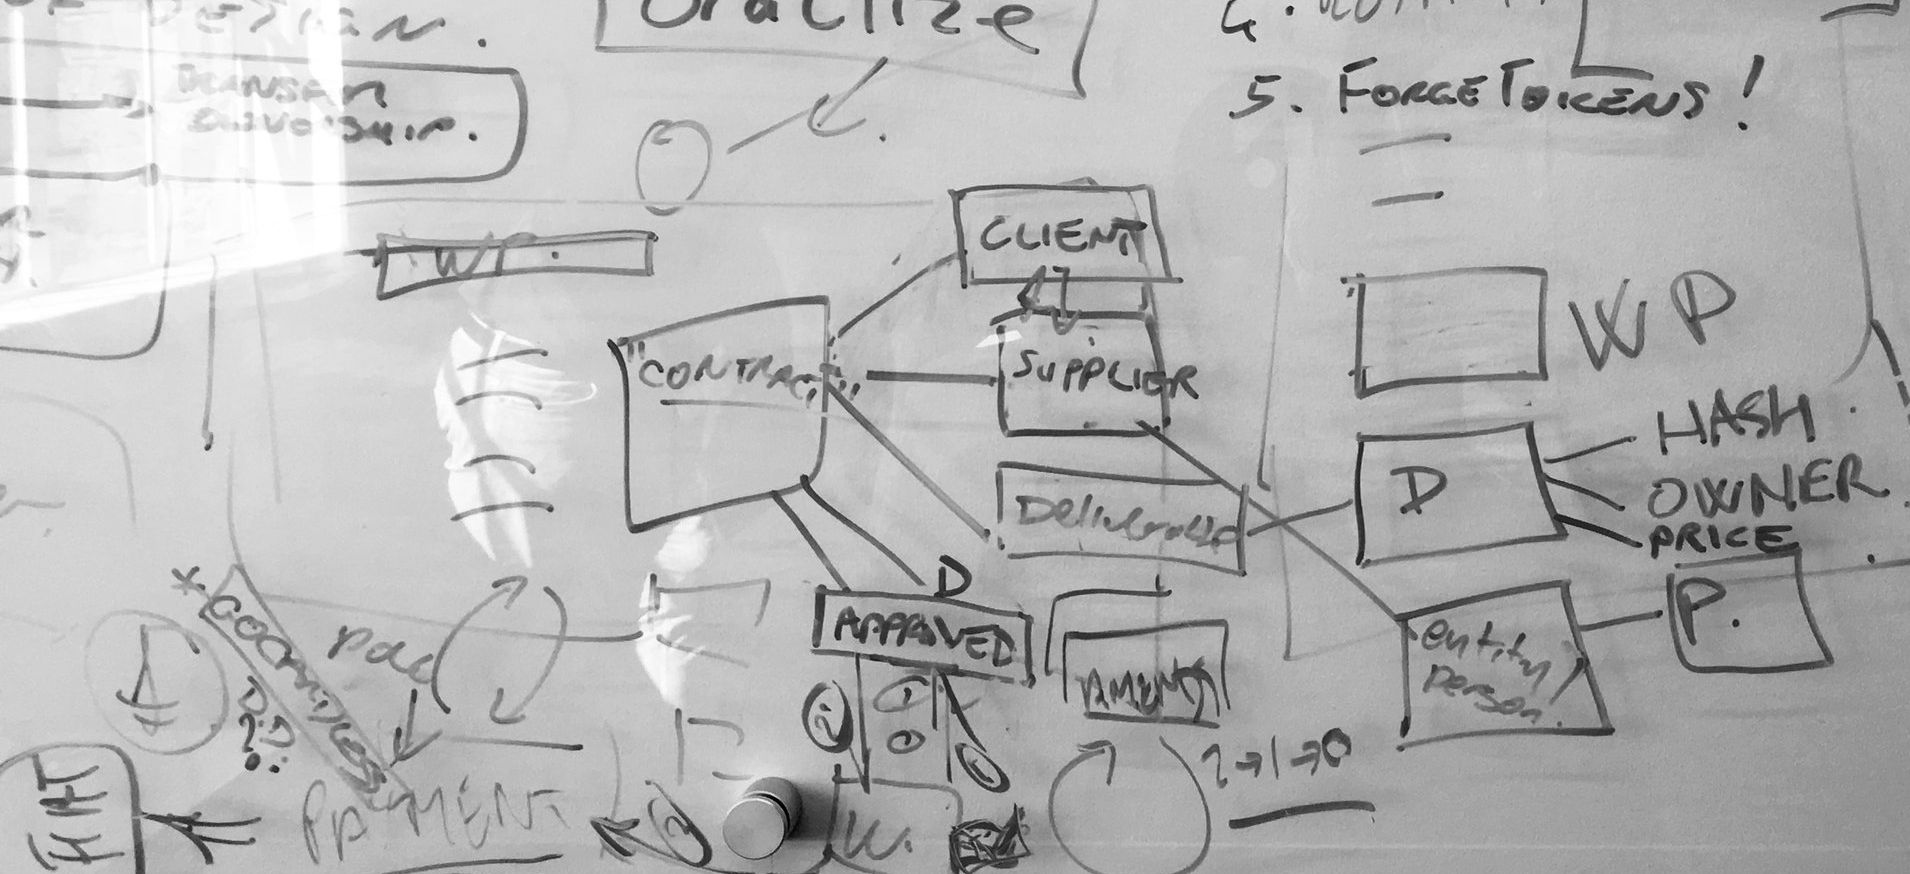 Creation in the blockchain -